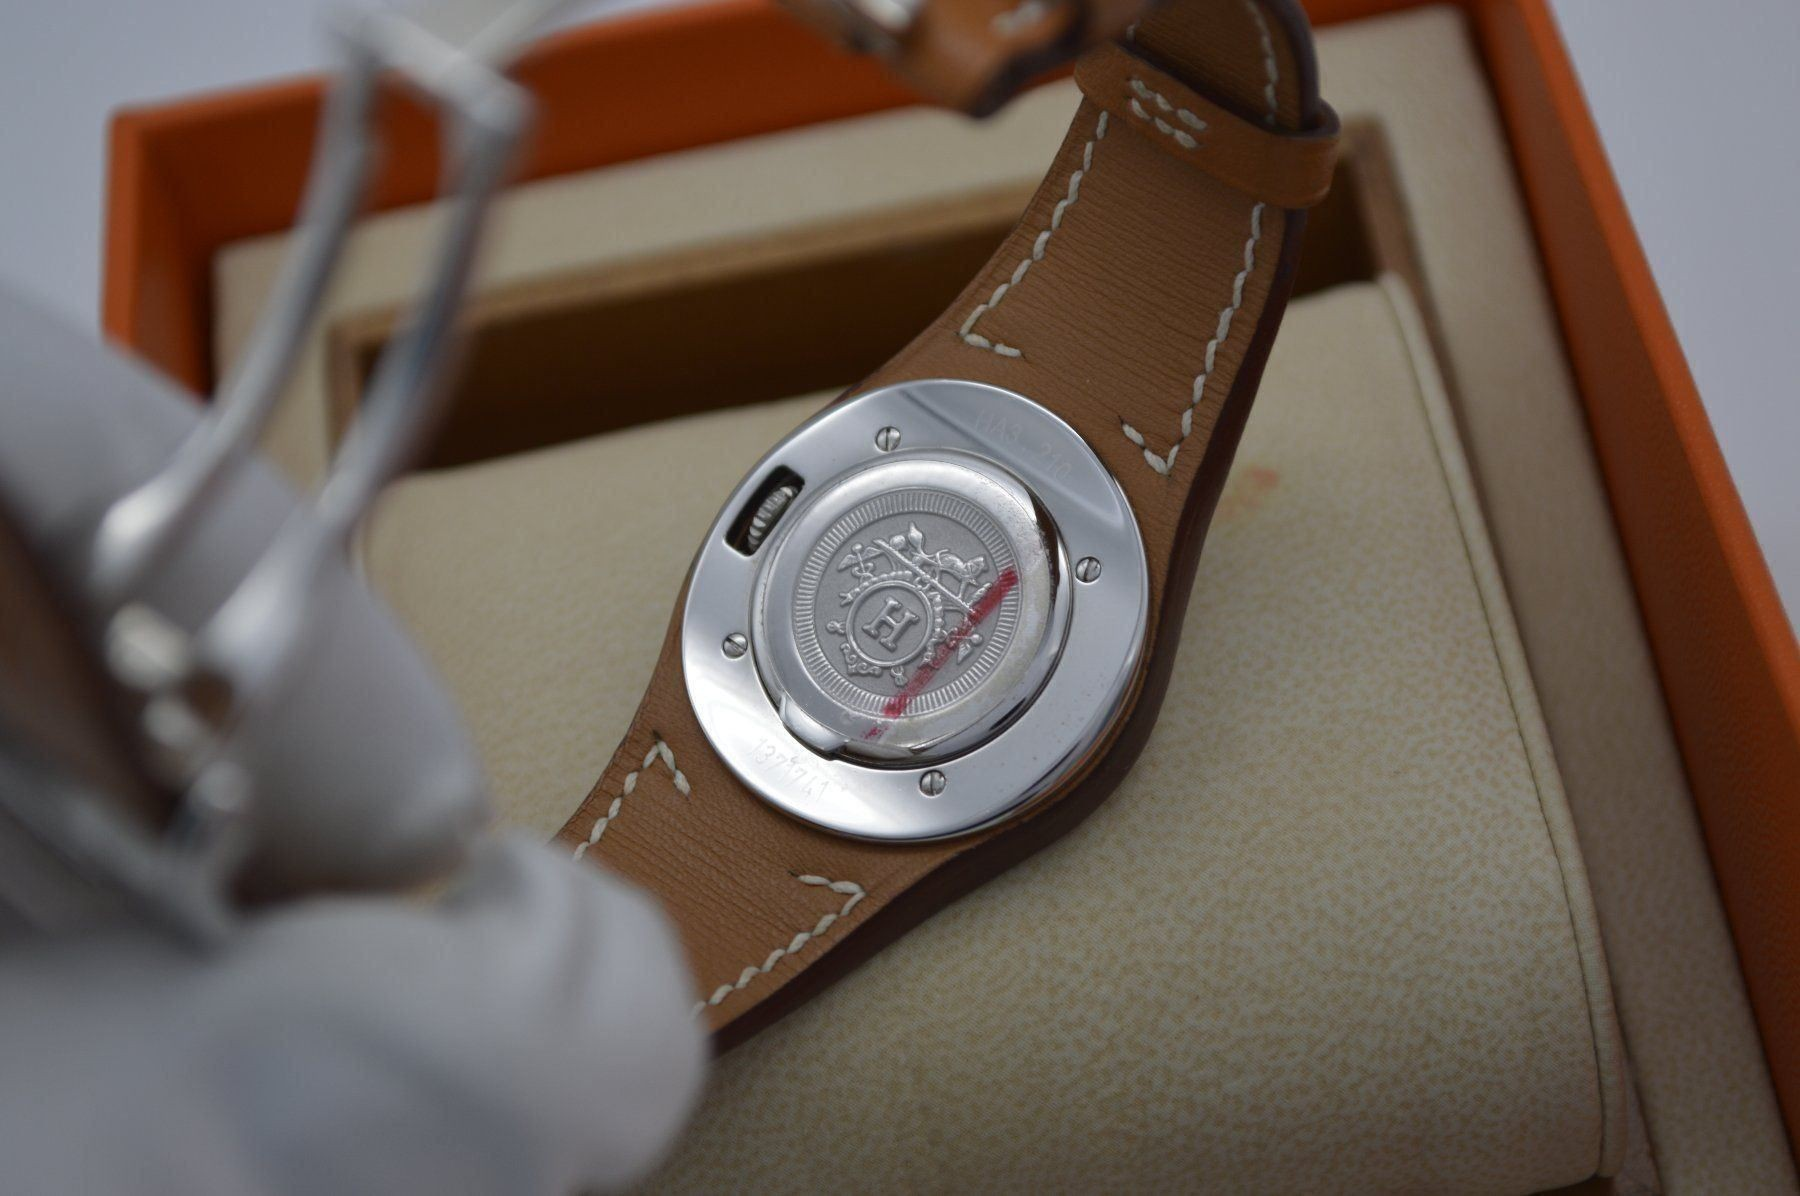 Herms / Harnais HA3.210 - Lady's Steel Wrist Watch - Image 4 of 6